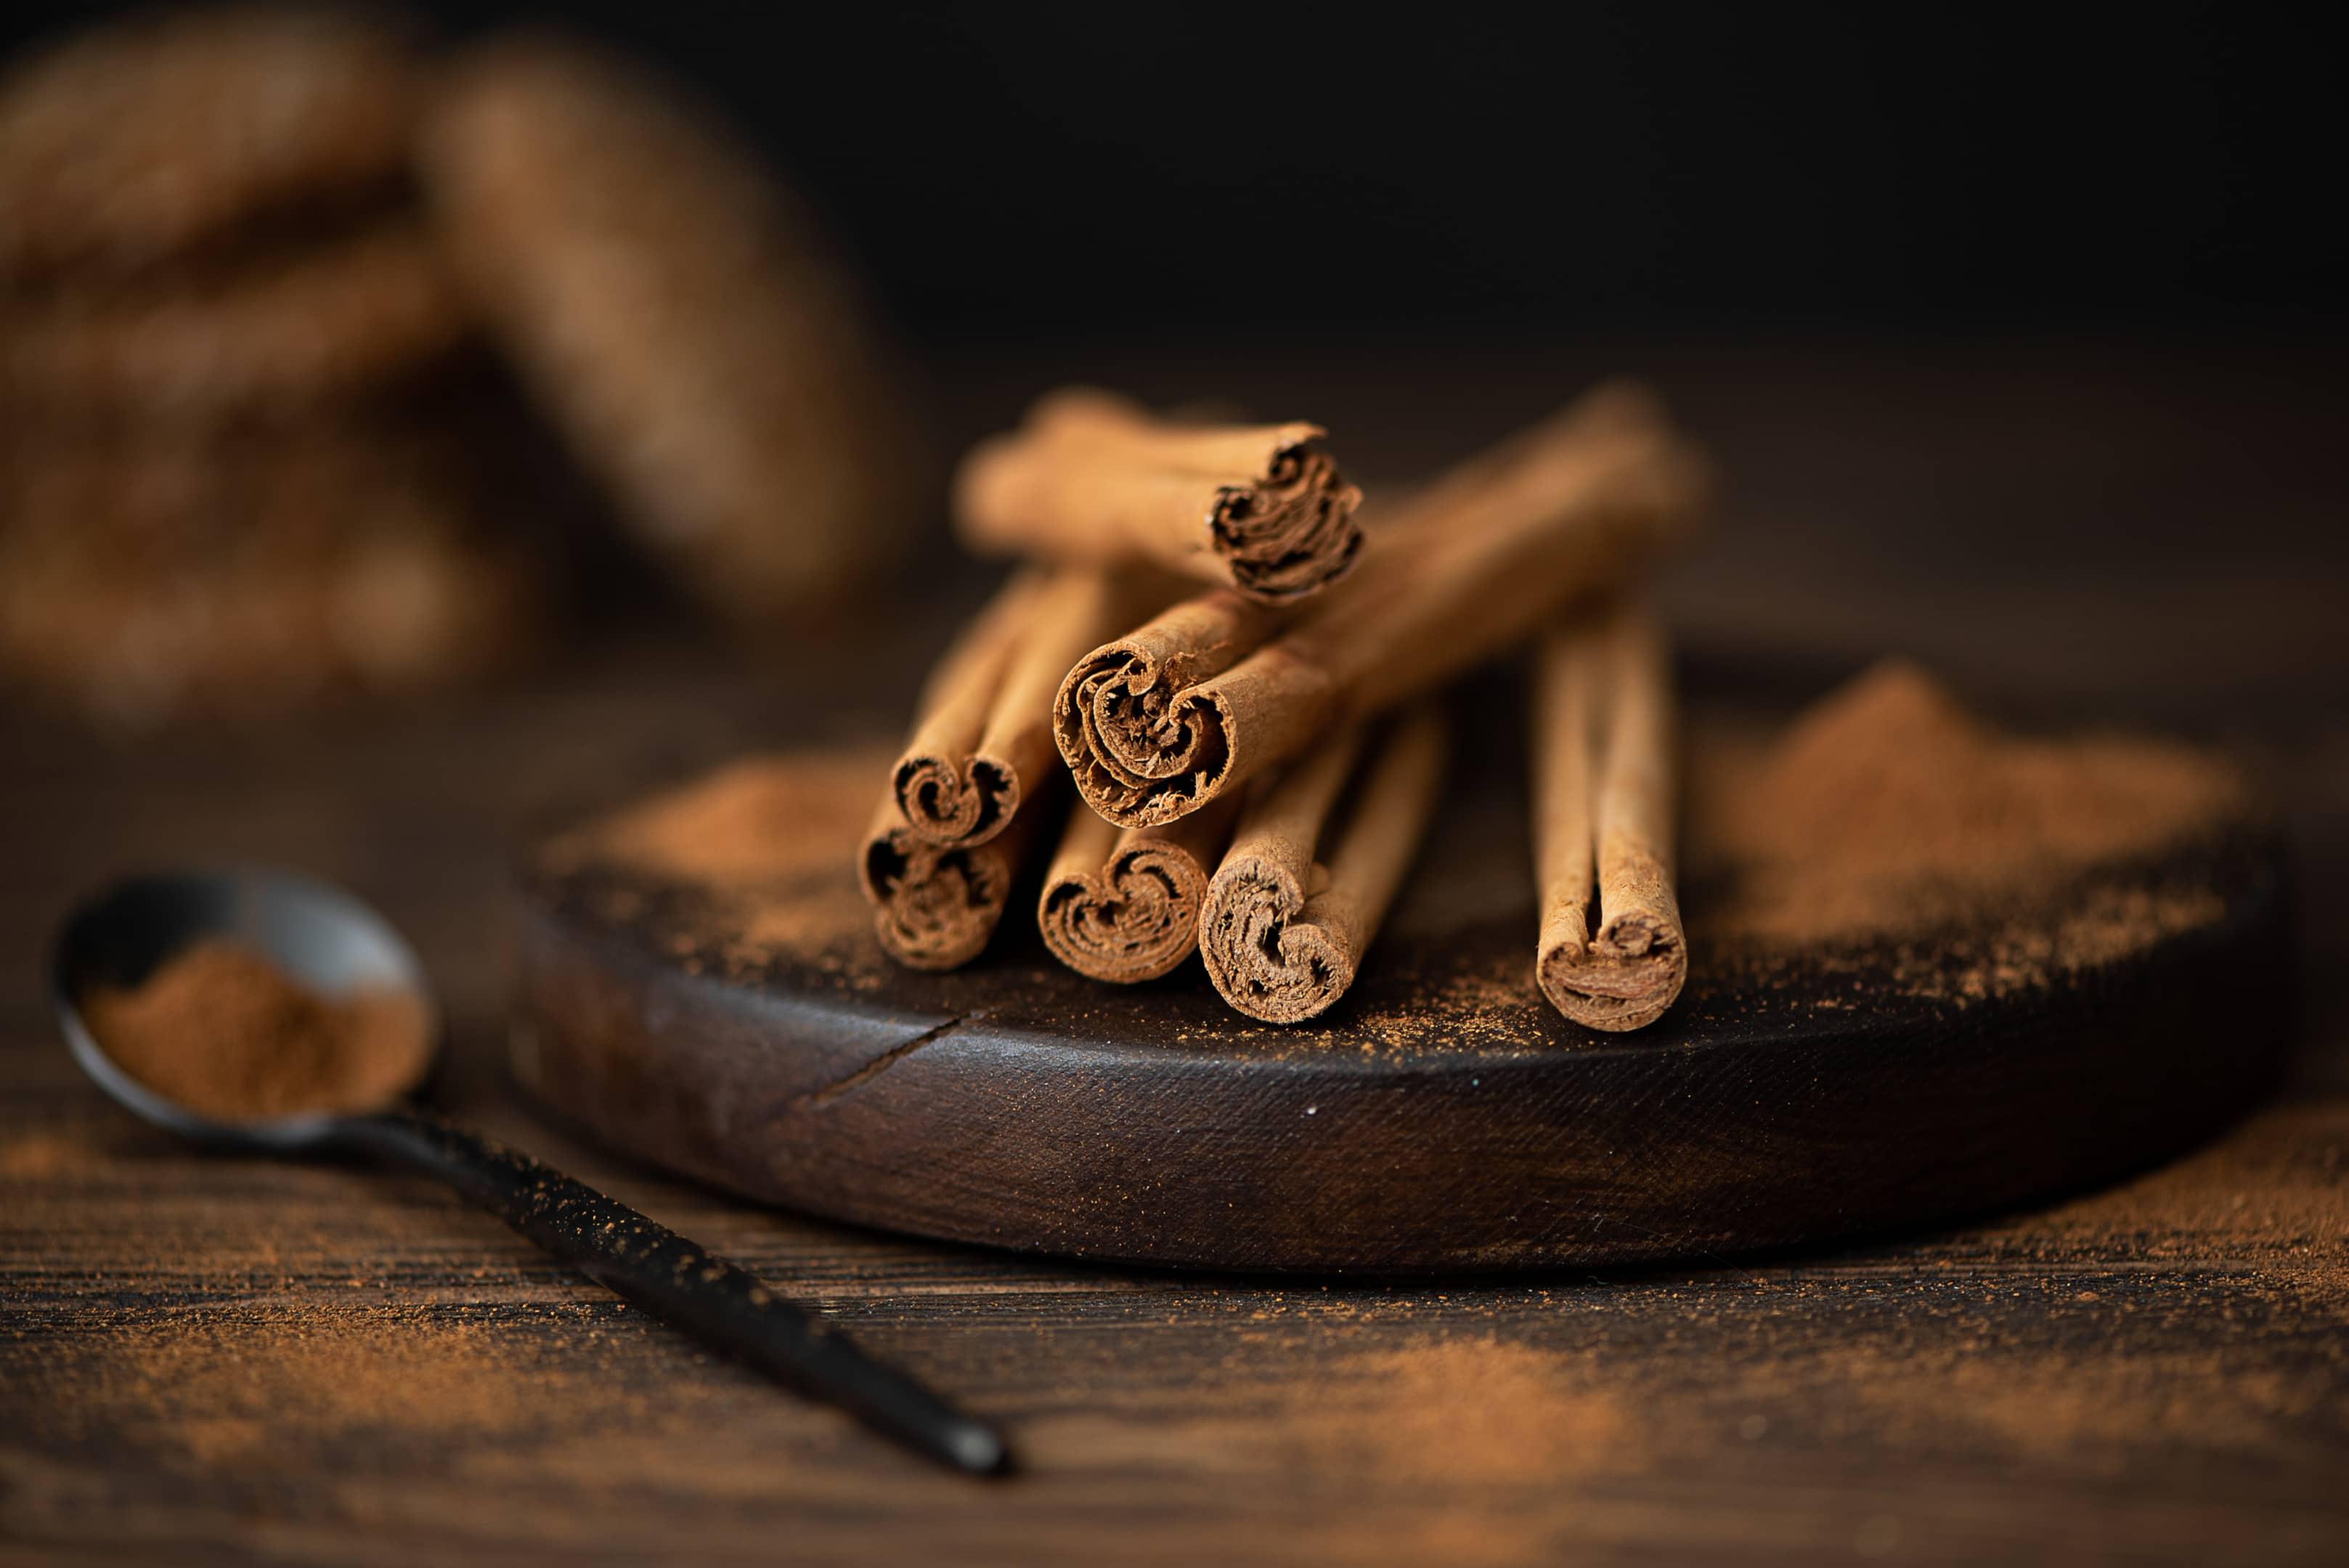 Cinnamon sticks and powder on wooden board